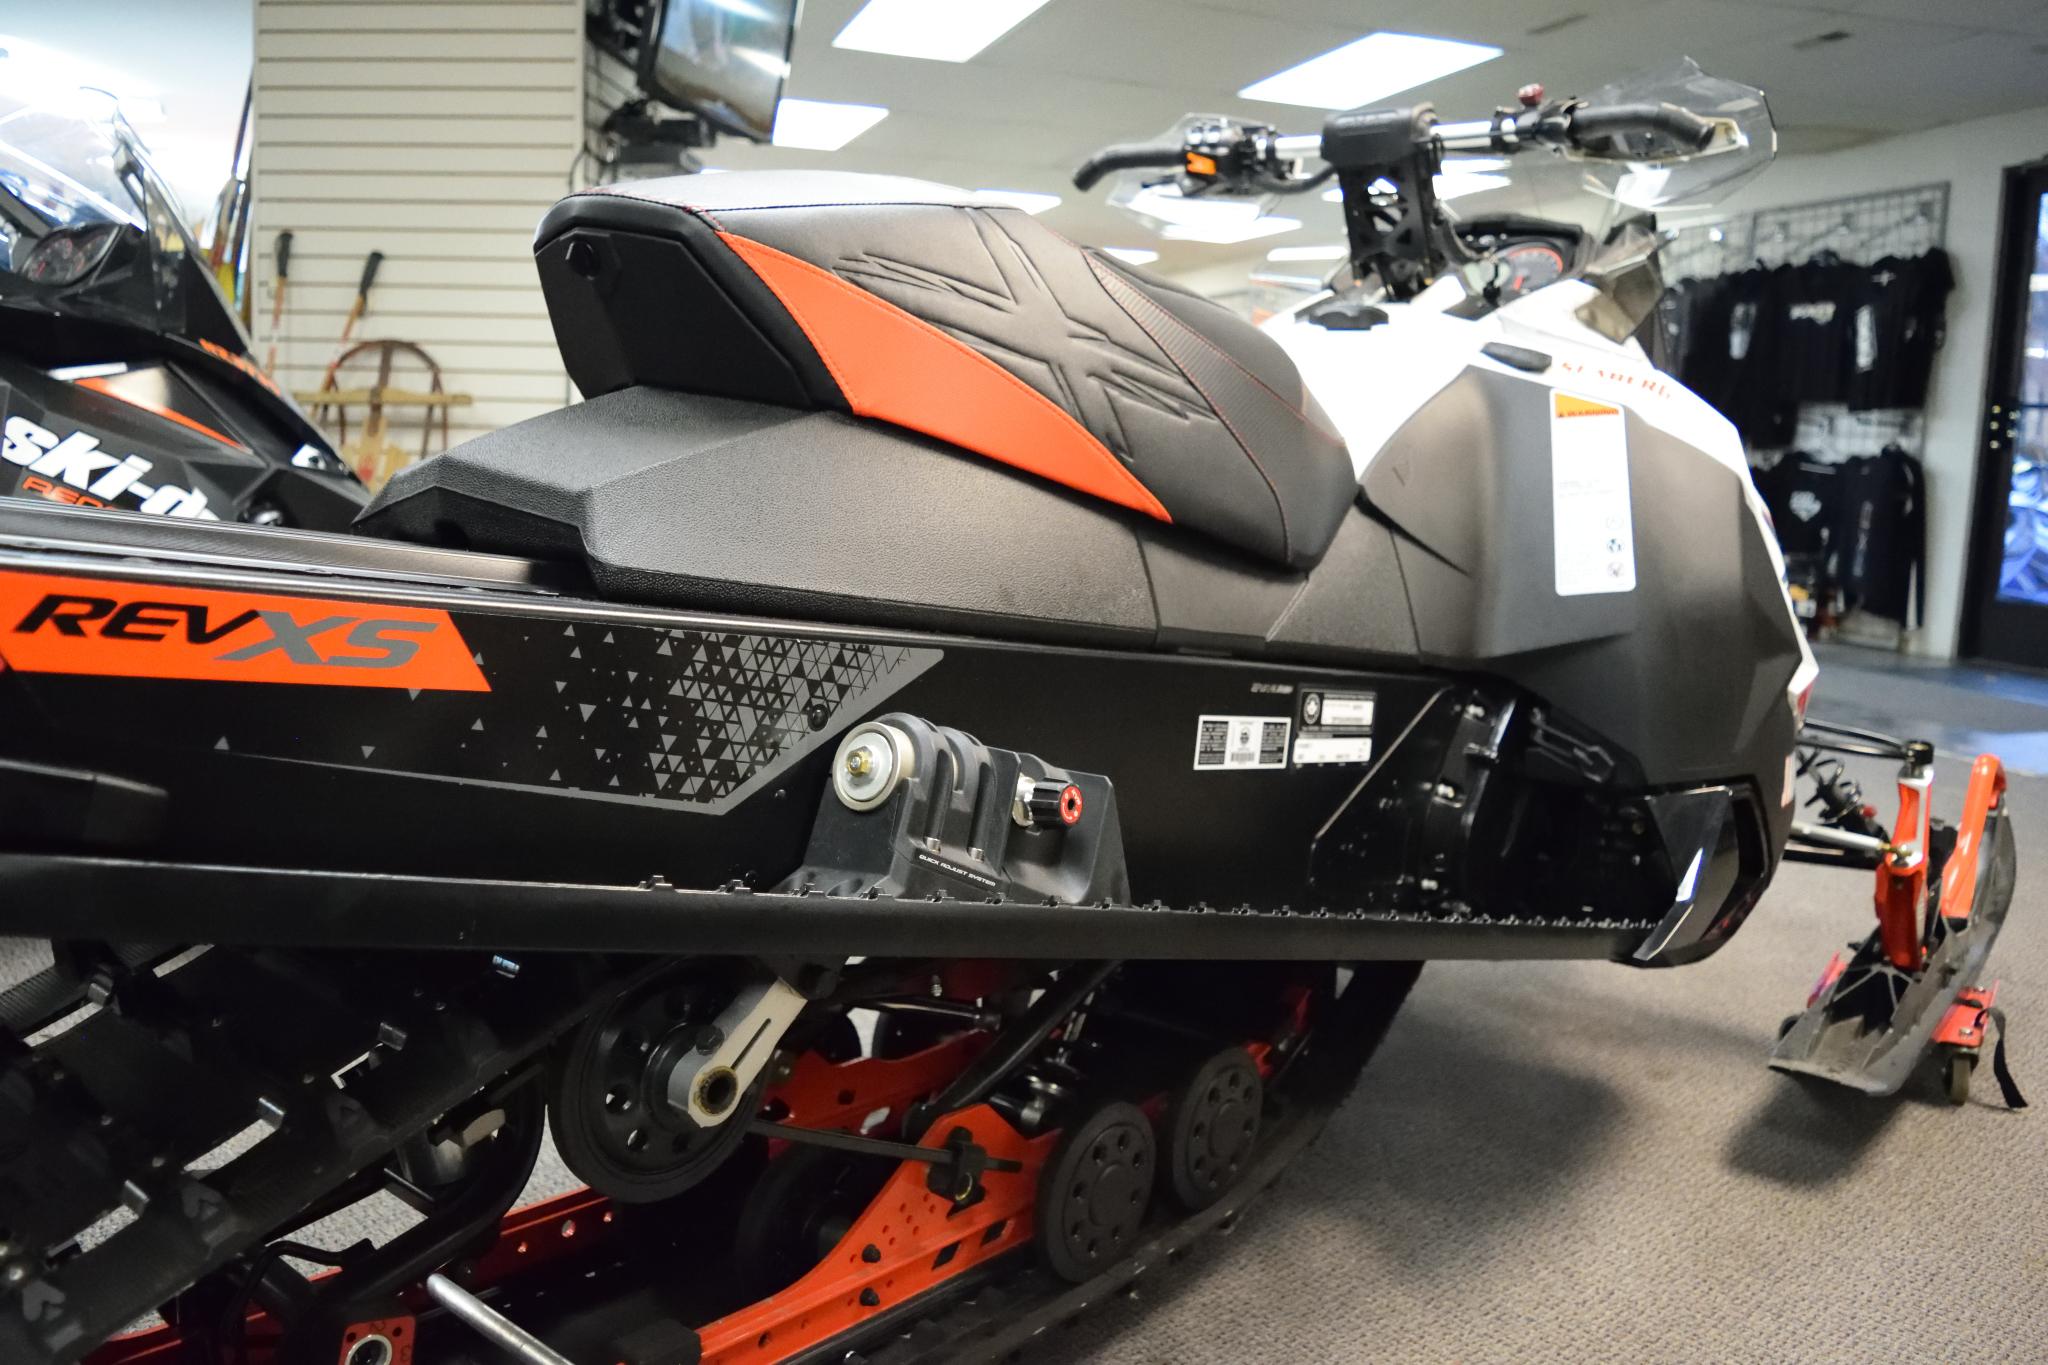 2016 Ski Doo Renegade X 600 HO E-TEC Seaberg Motorsports Crosslake Minnesota Rear with Adusters